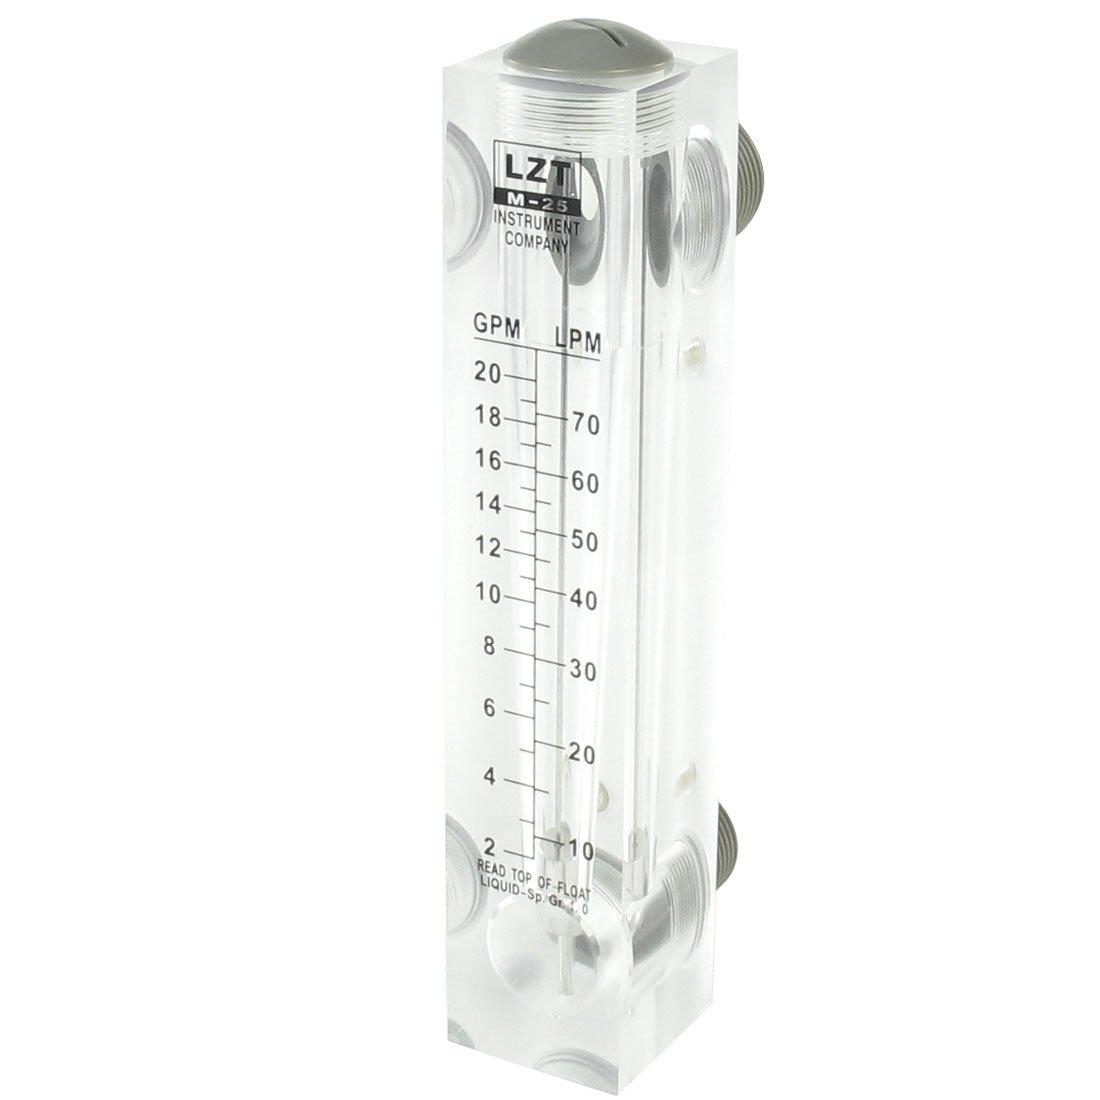 uxcell 1'' PT Thread Input 2-20 GPM Water Liquid Flow Measuring Flowmeter